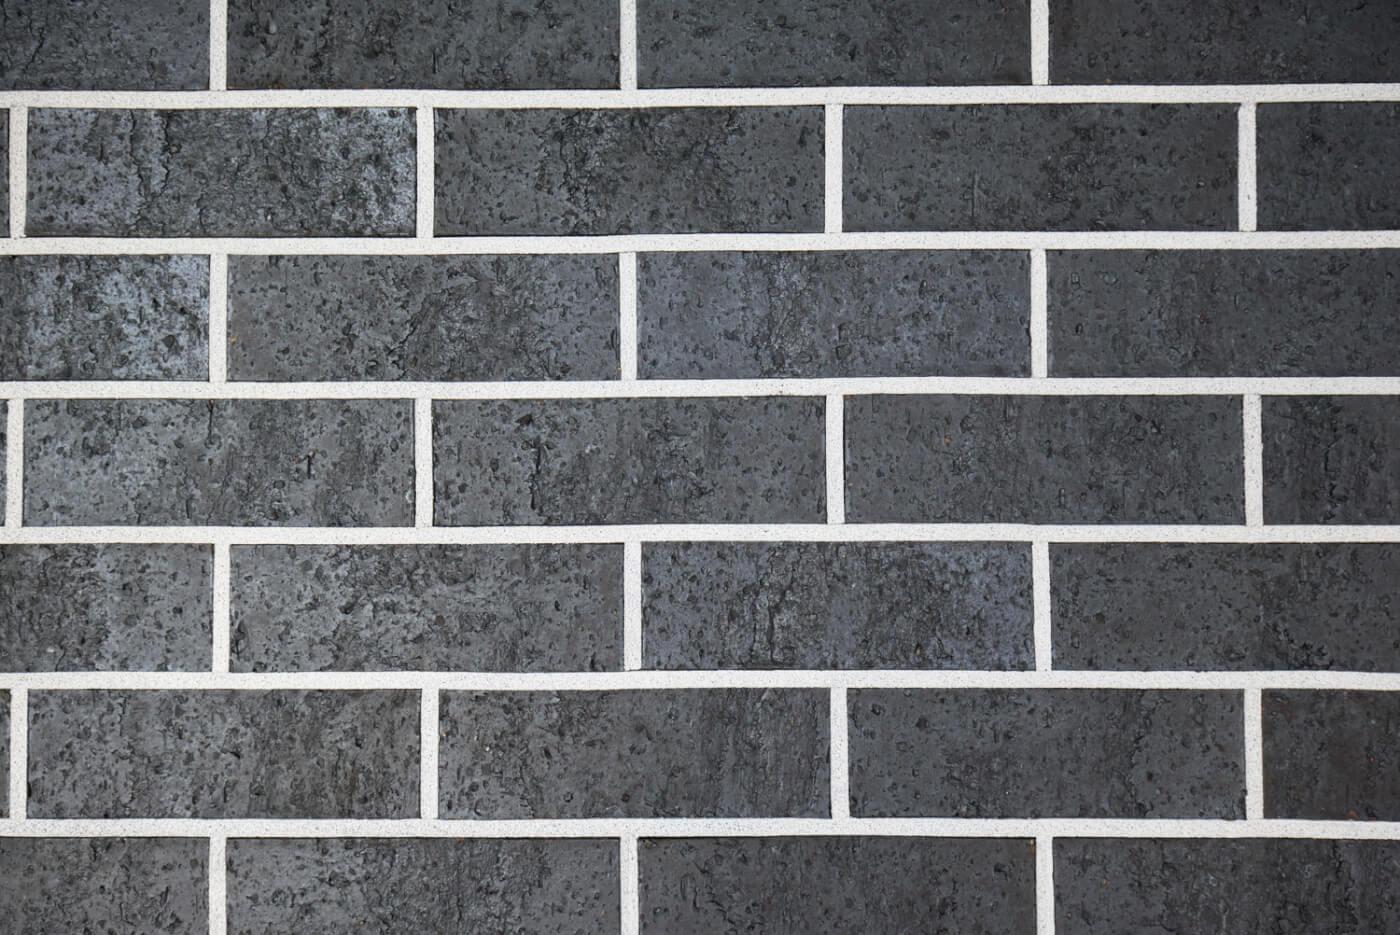 Midnight Black Brick Wall Reduced Size